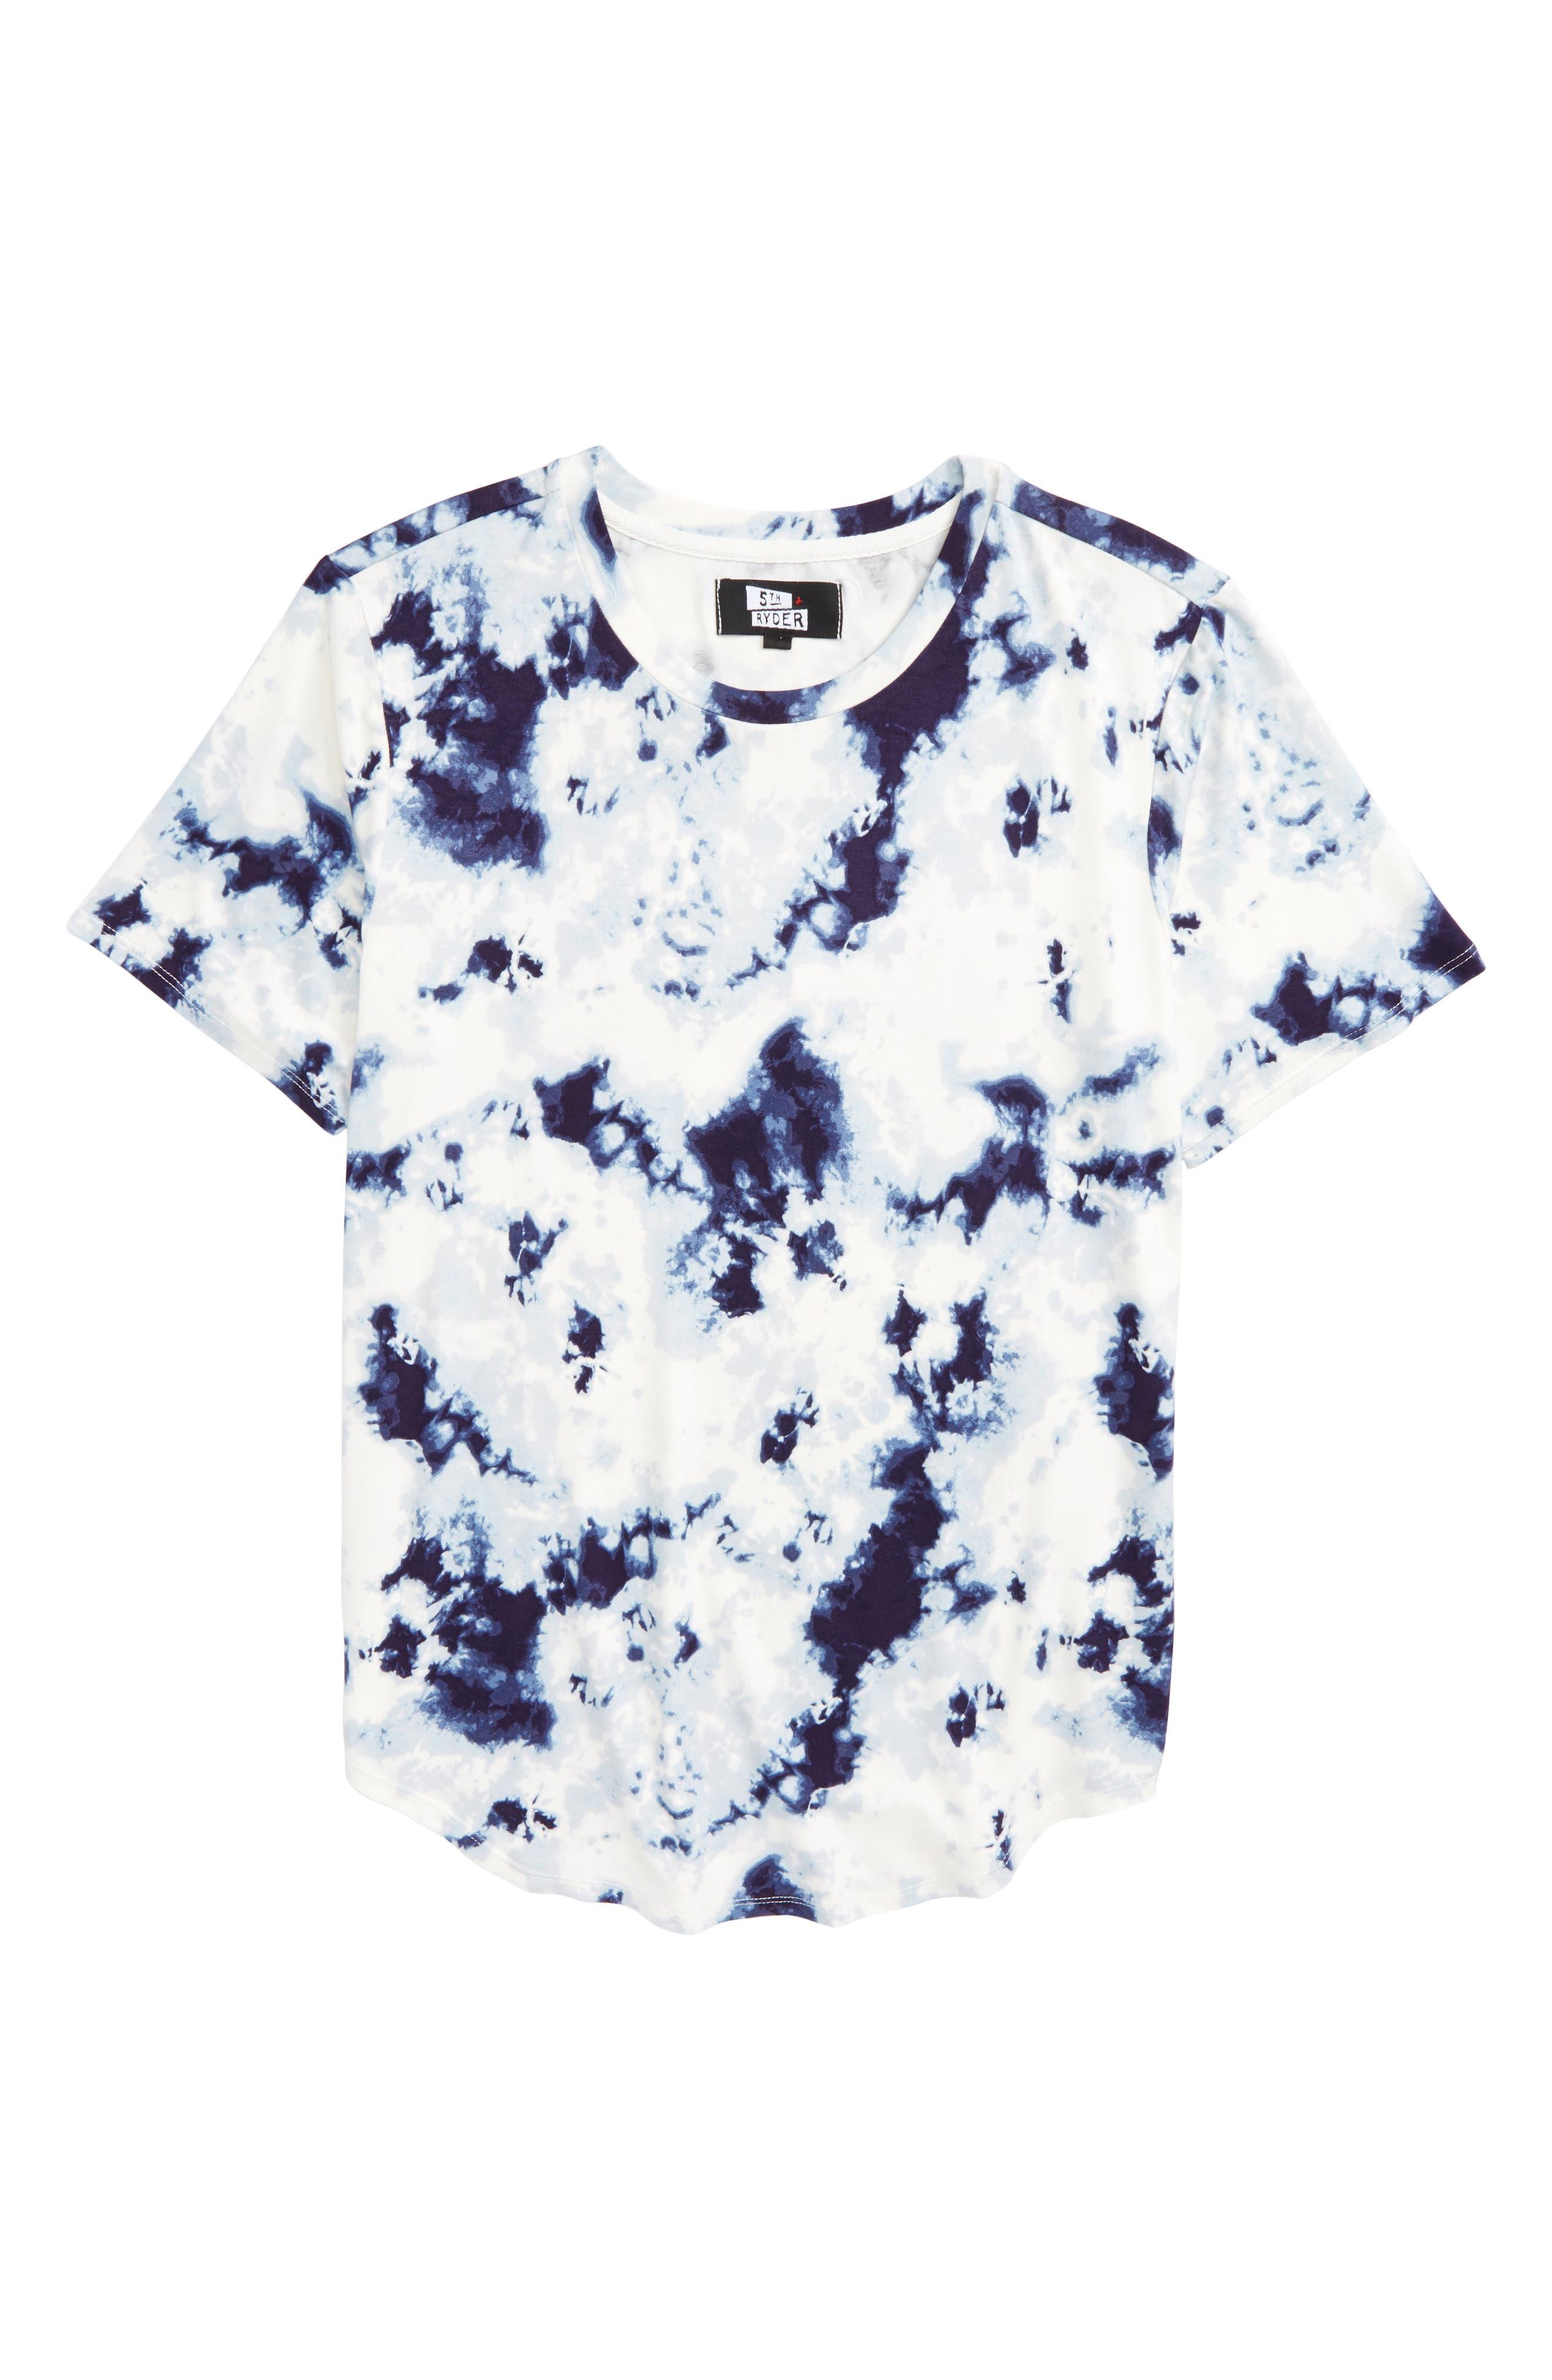 Alternate Image 1 Selected - 5th and Ryder Curved Hem T-Shirt (Big Boys)